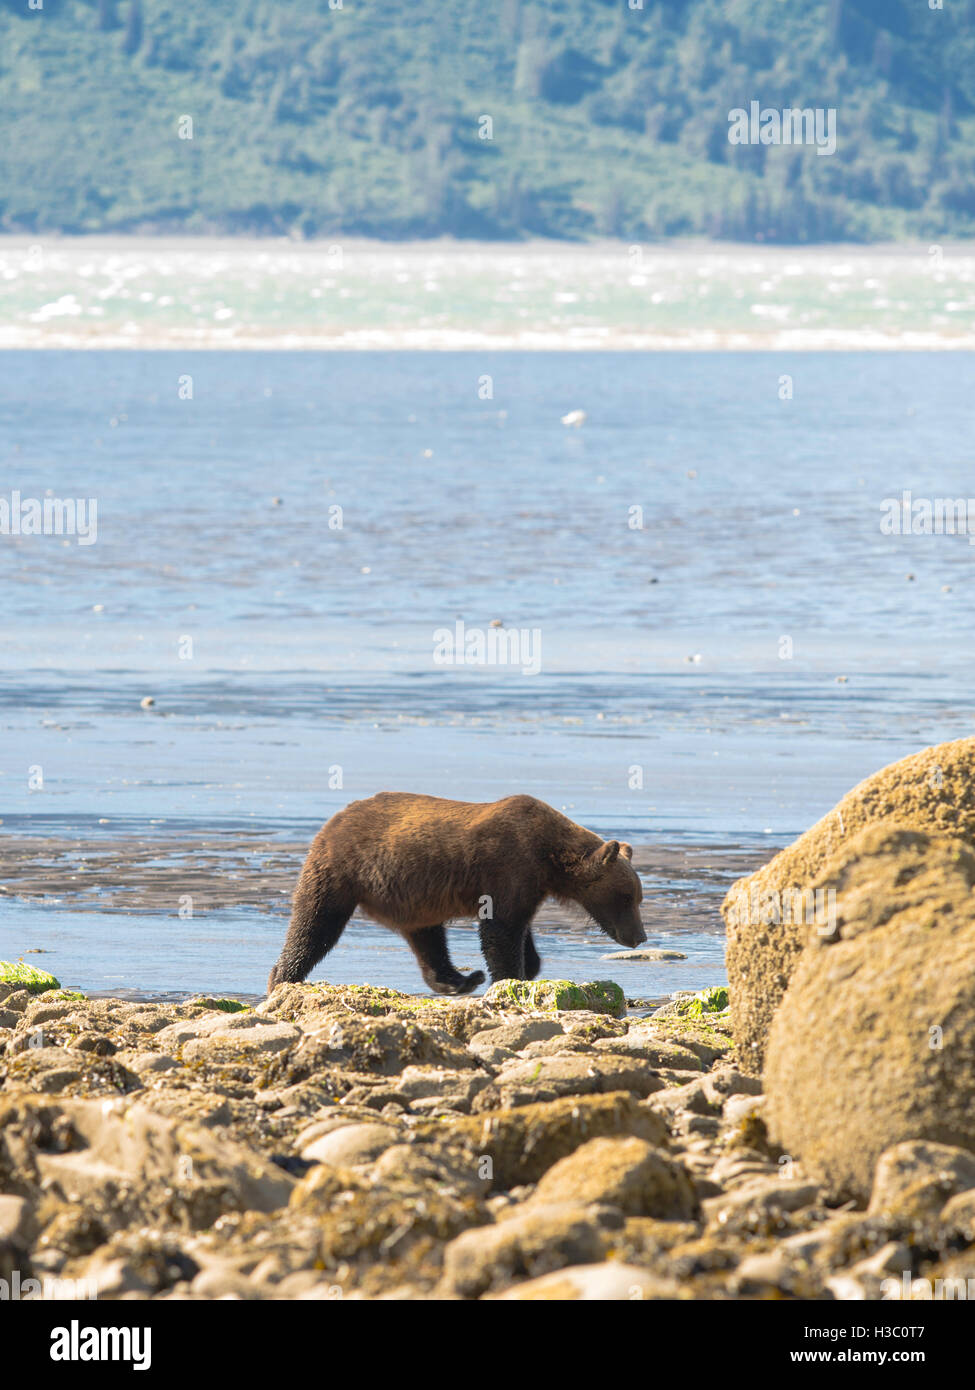 An Alaska coastal brown bear walks across the rocks on the shore of Chinitna Bay, Lake Clark National Park, Alaska. - Stock Image